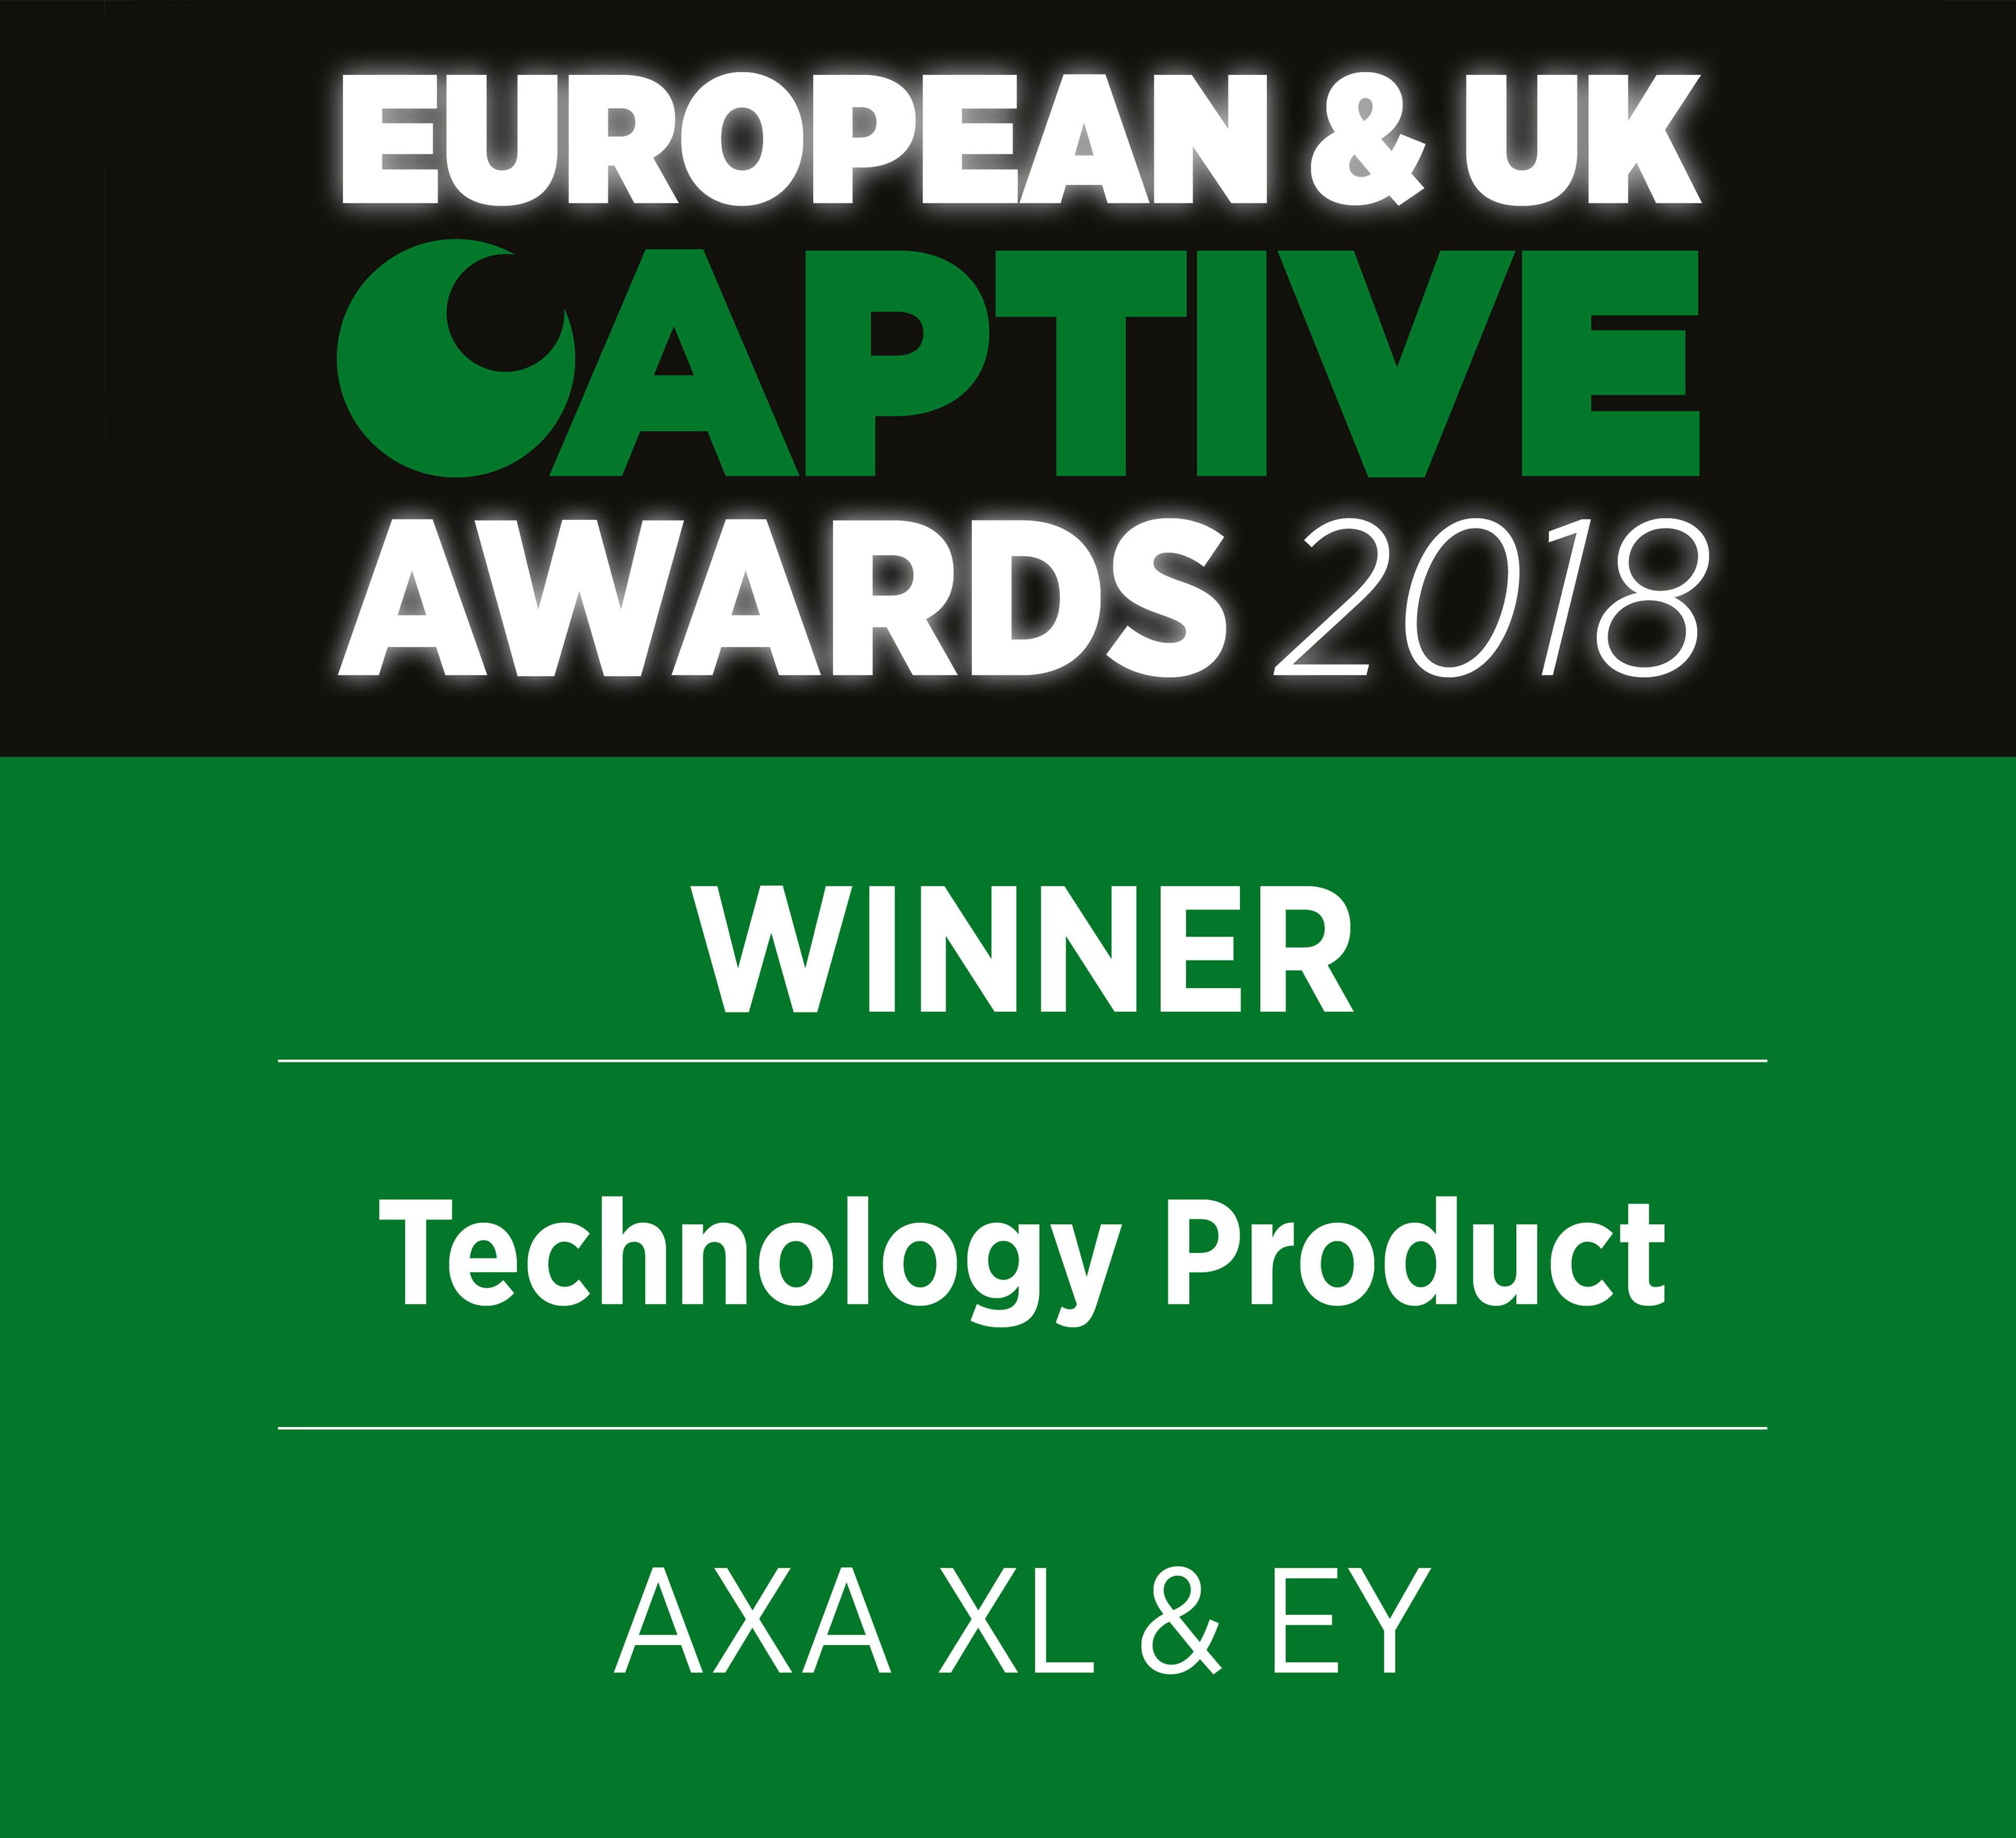 European & UK Captive Awards 2018 Winner Technology Product AXA XL & EY